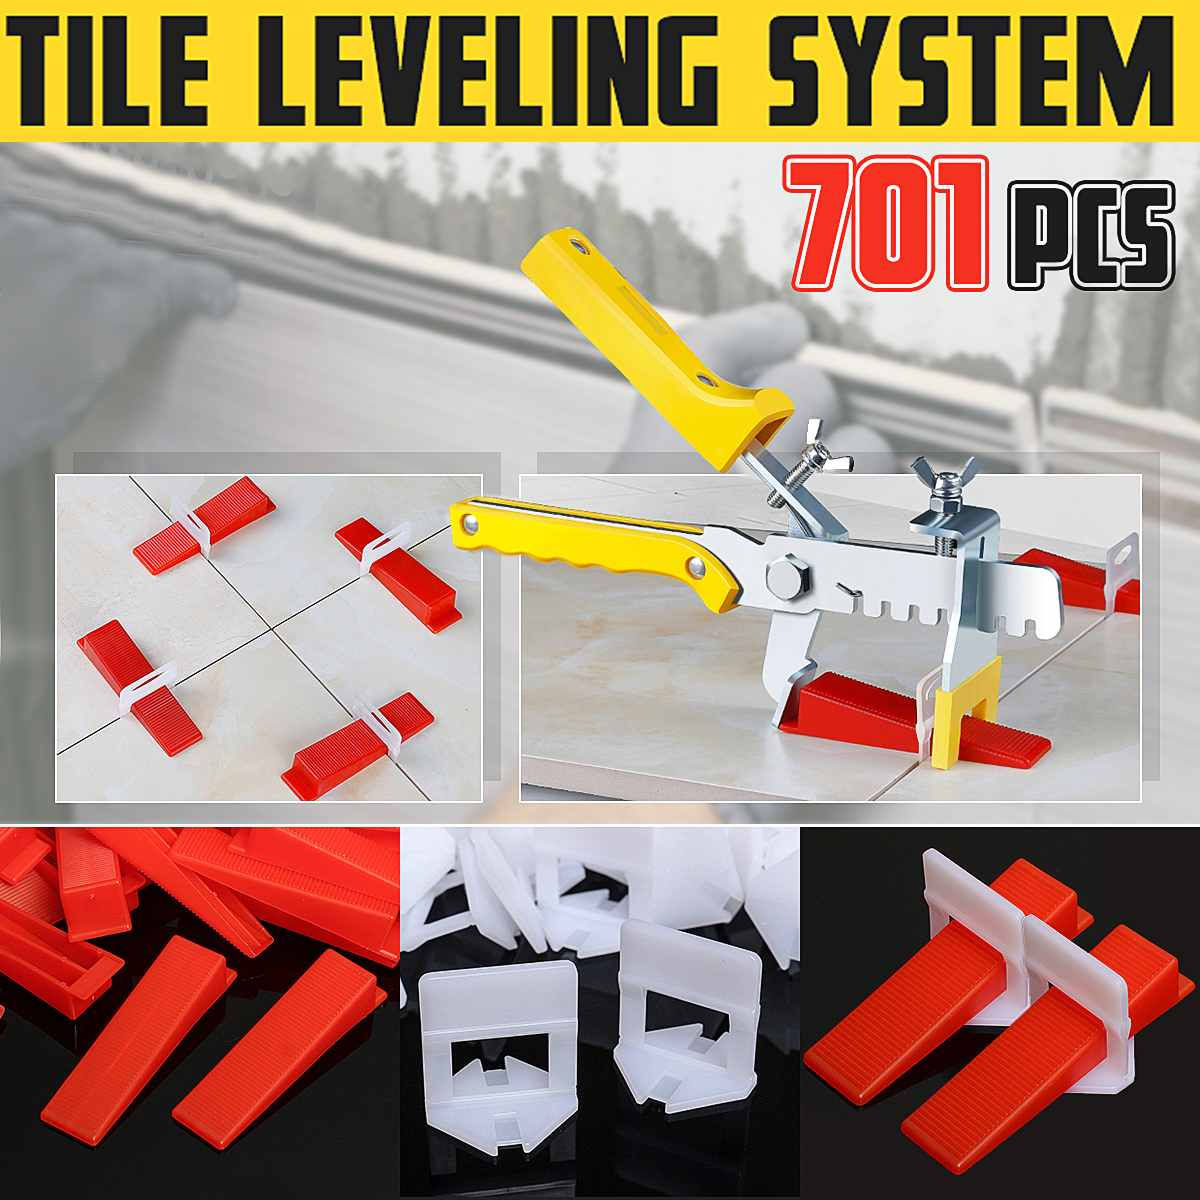 700Pcs Tile Leveling System 500 Clips + 200 Wedges + 1 Pliers Plastic Ceramic Tiling Flooring Tools Tile Spacer